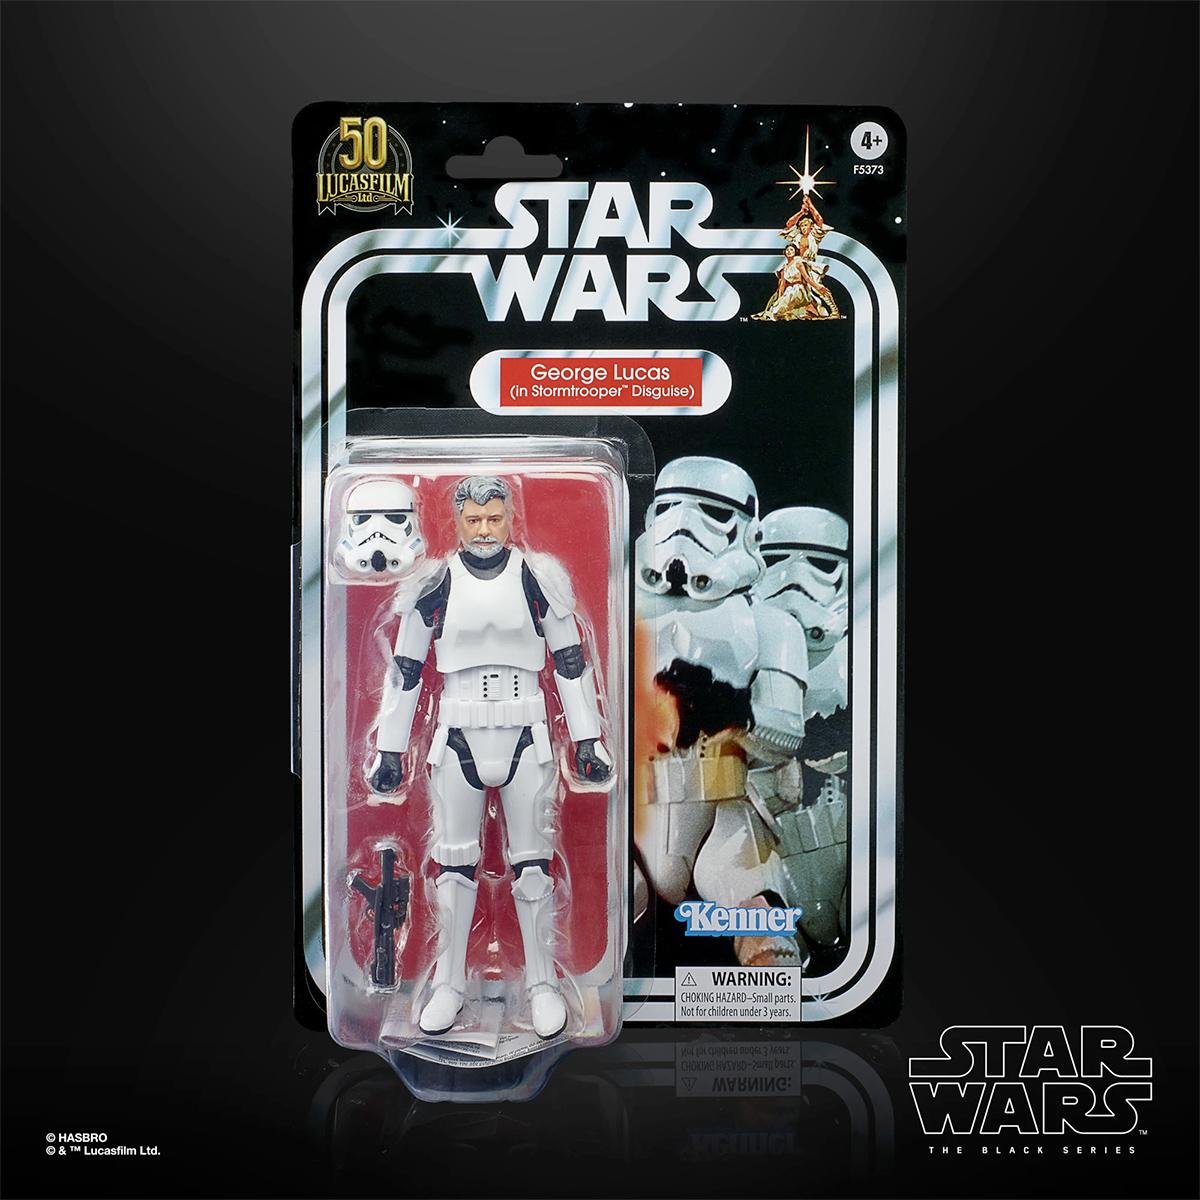 George Lucas (In Stormtrooper Disguise) Star Wars The Black Series Action Figure